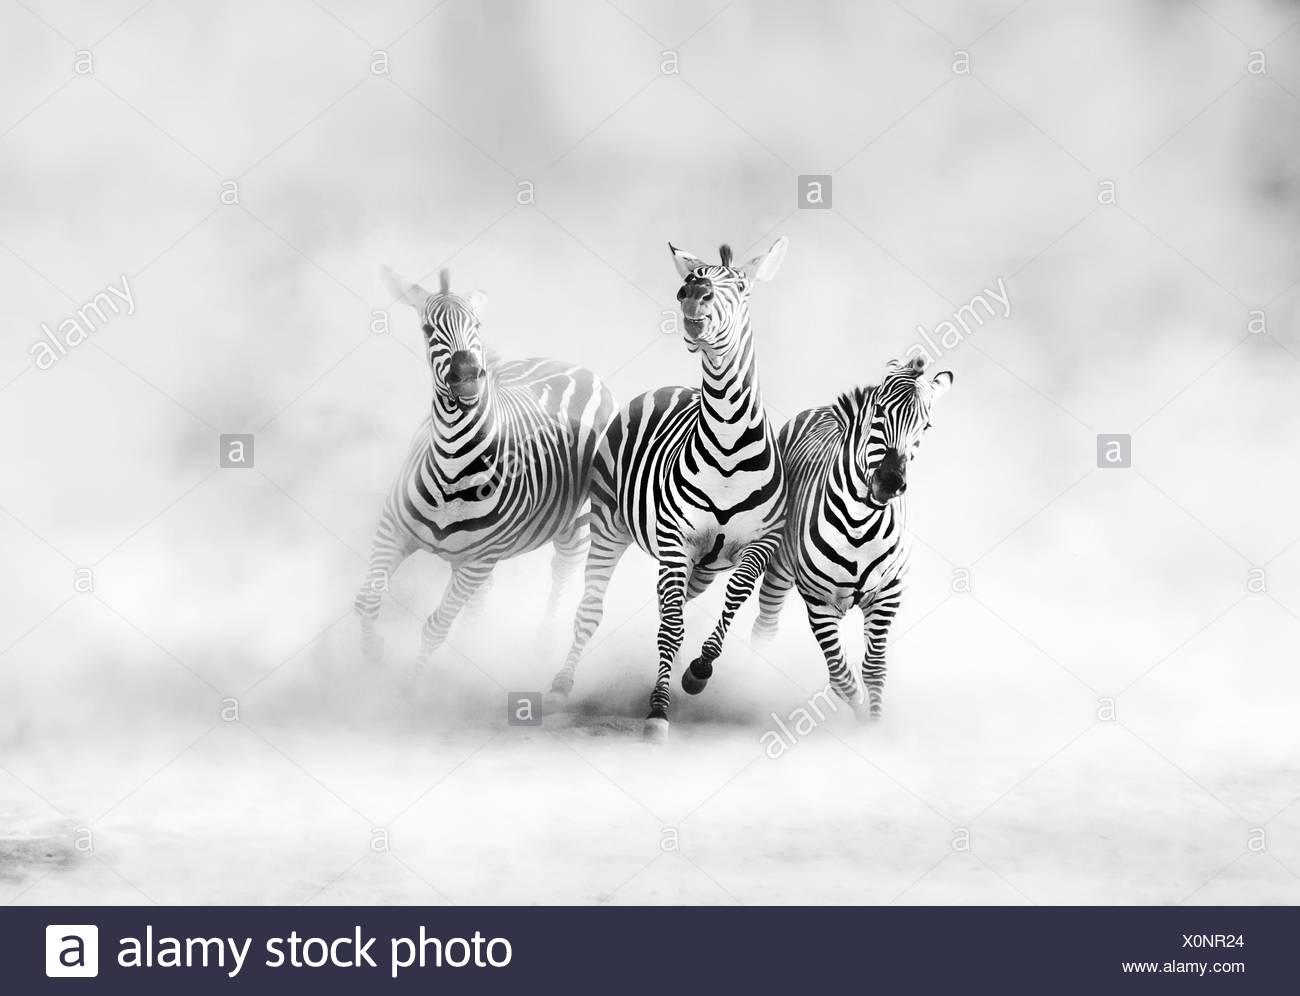 Zebras (perissodactyla) running in dust cloud - Stock Image